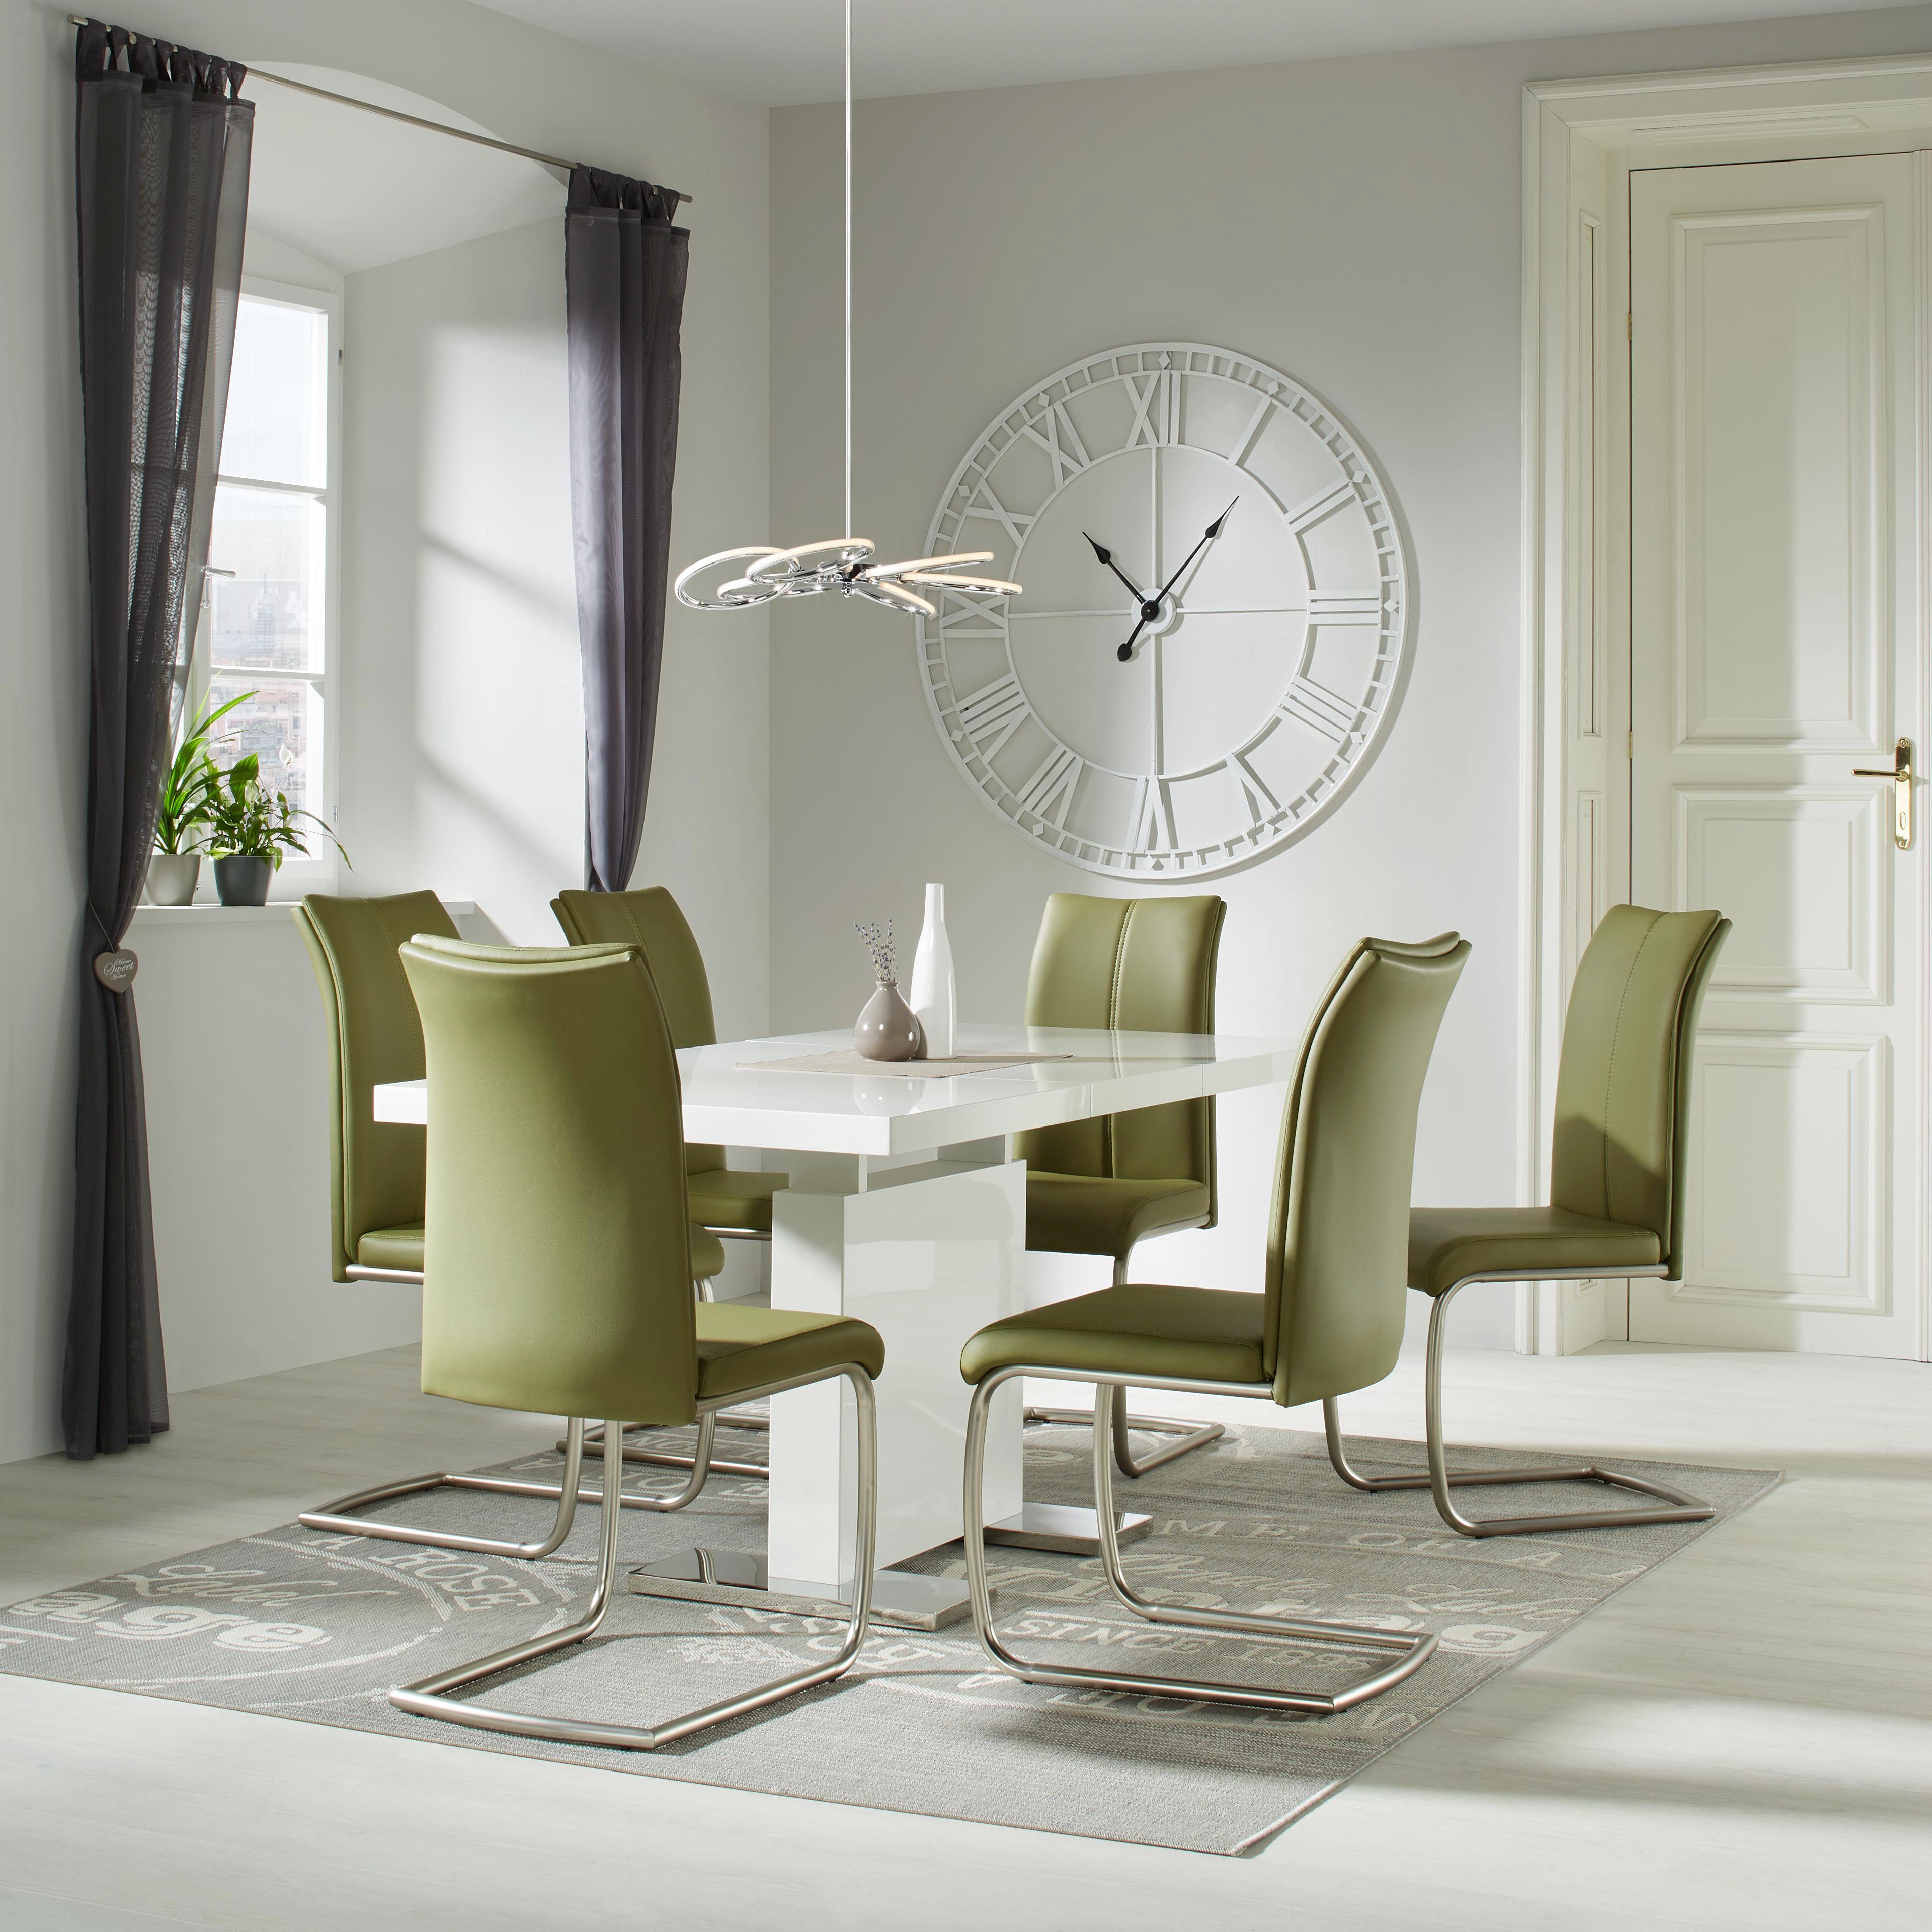 LED-Hängeleuchte Alisia, 6x450 Lumen - Chromfarben, MODERN, Kunststoff/Metall (46,2/120cm) - MÖMAX modern living